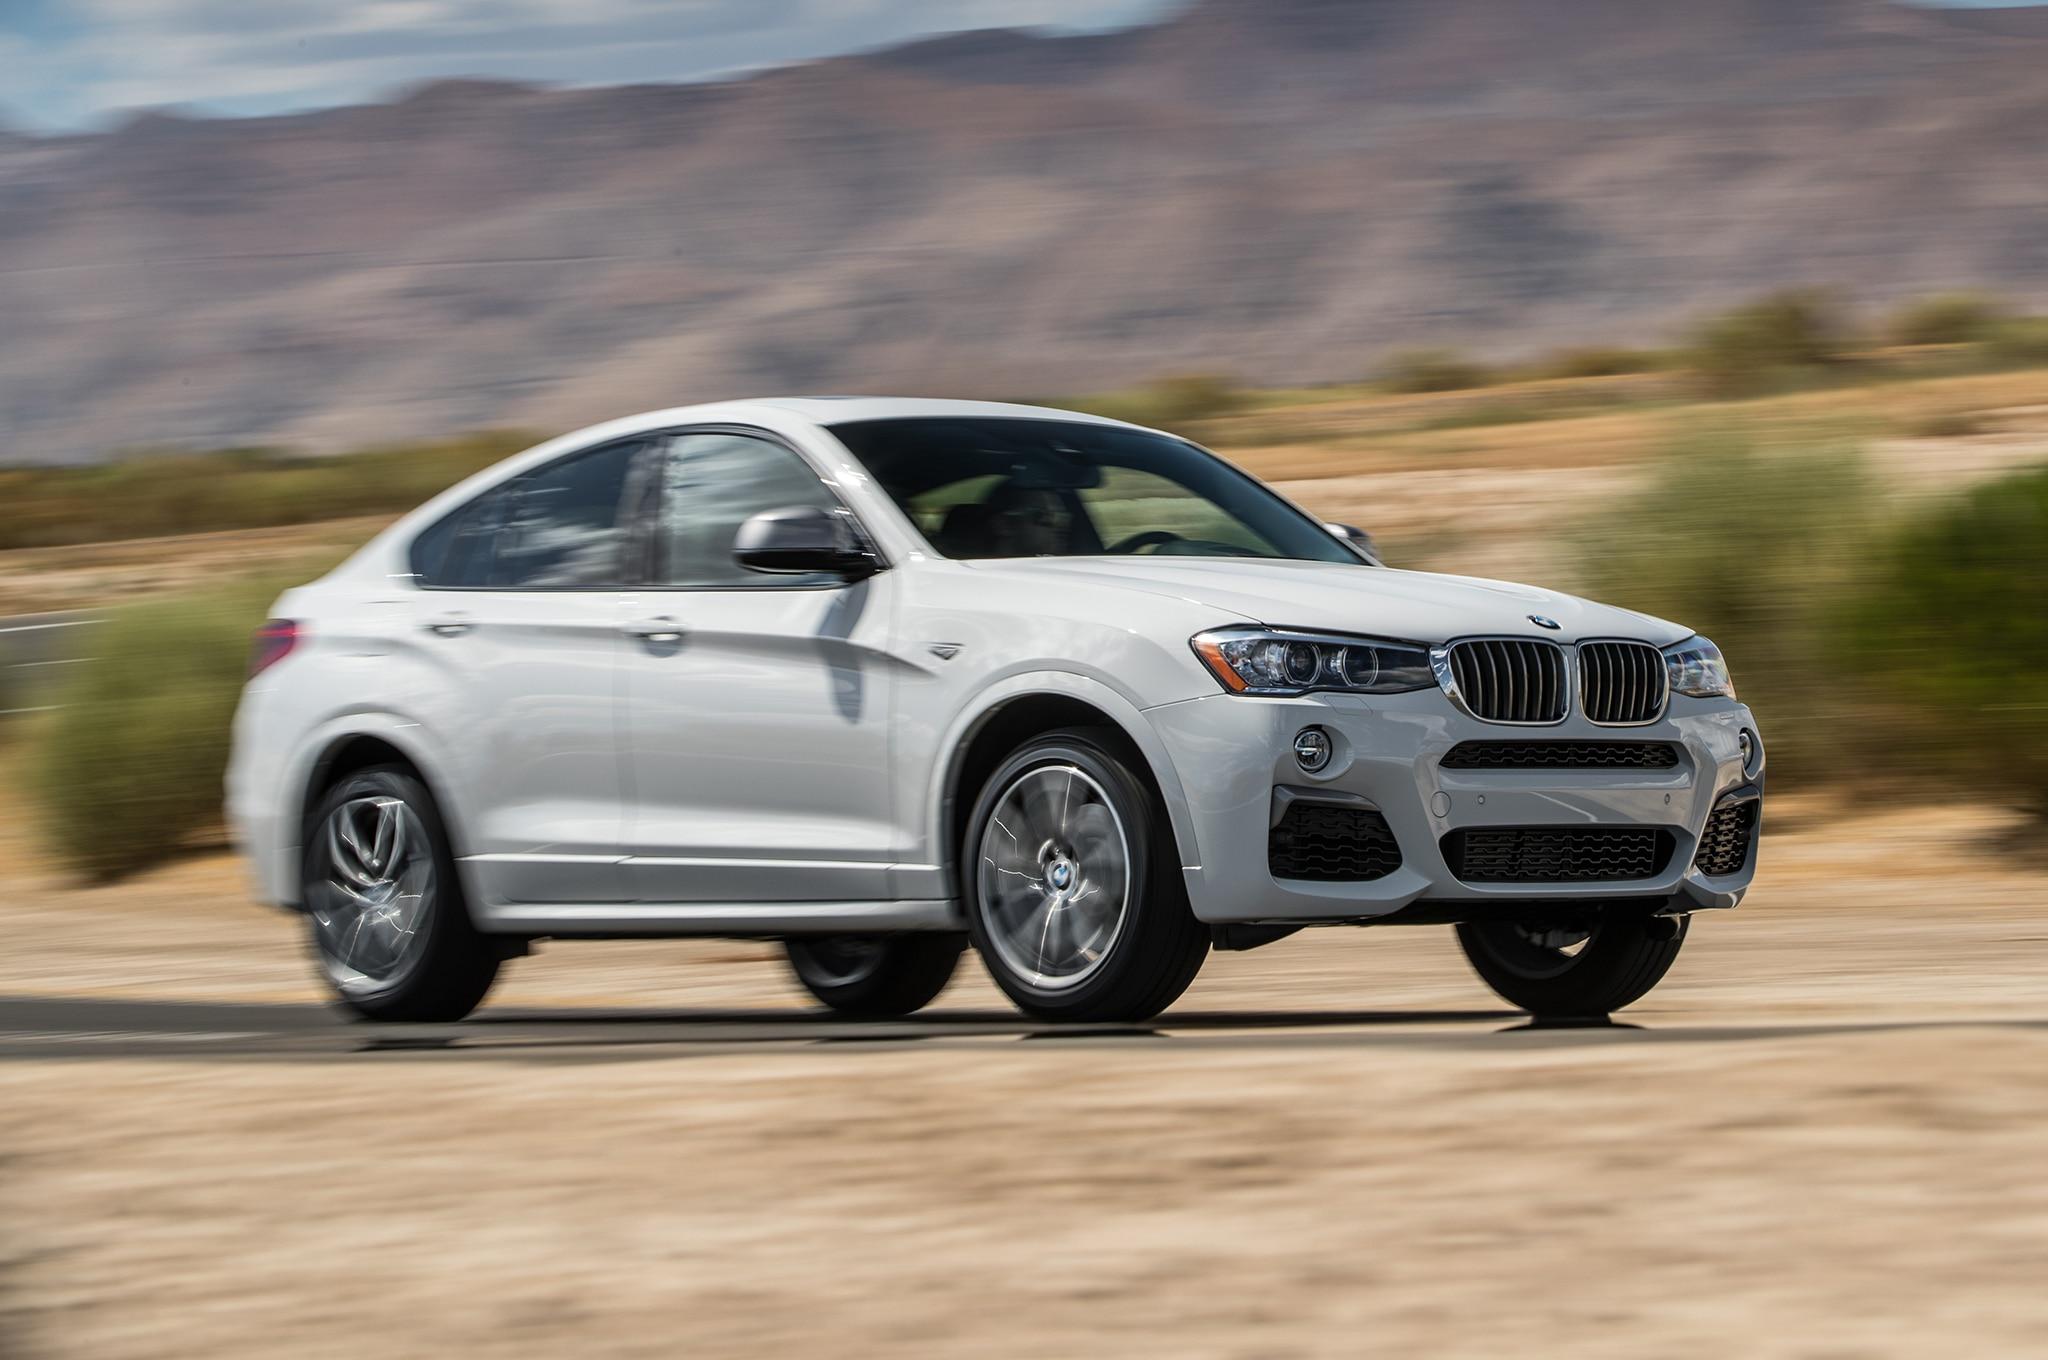 2018 BMW X4 M40i Front Three Quarter In Motion